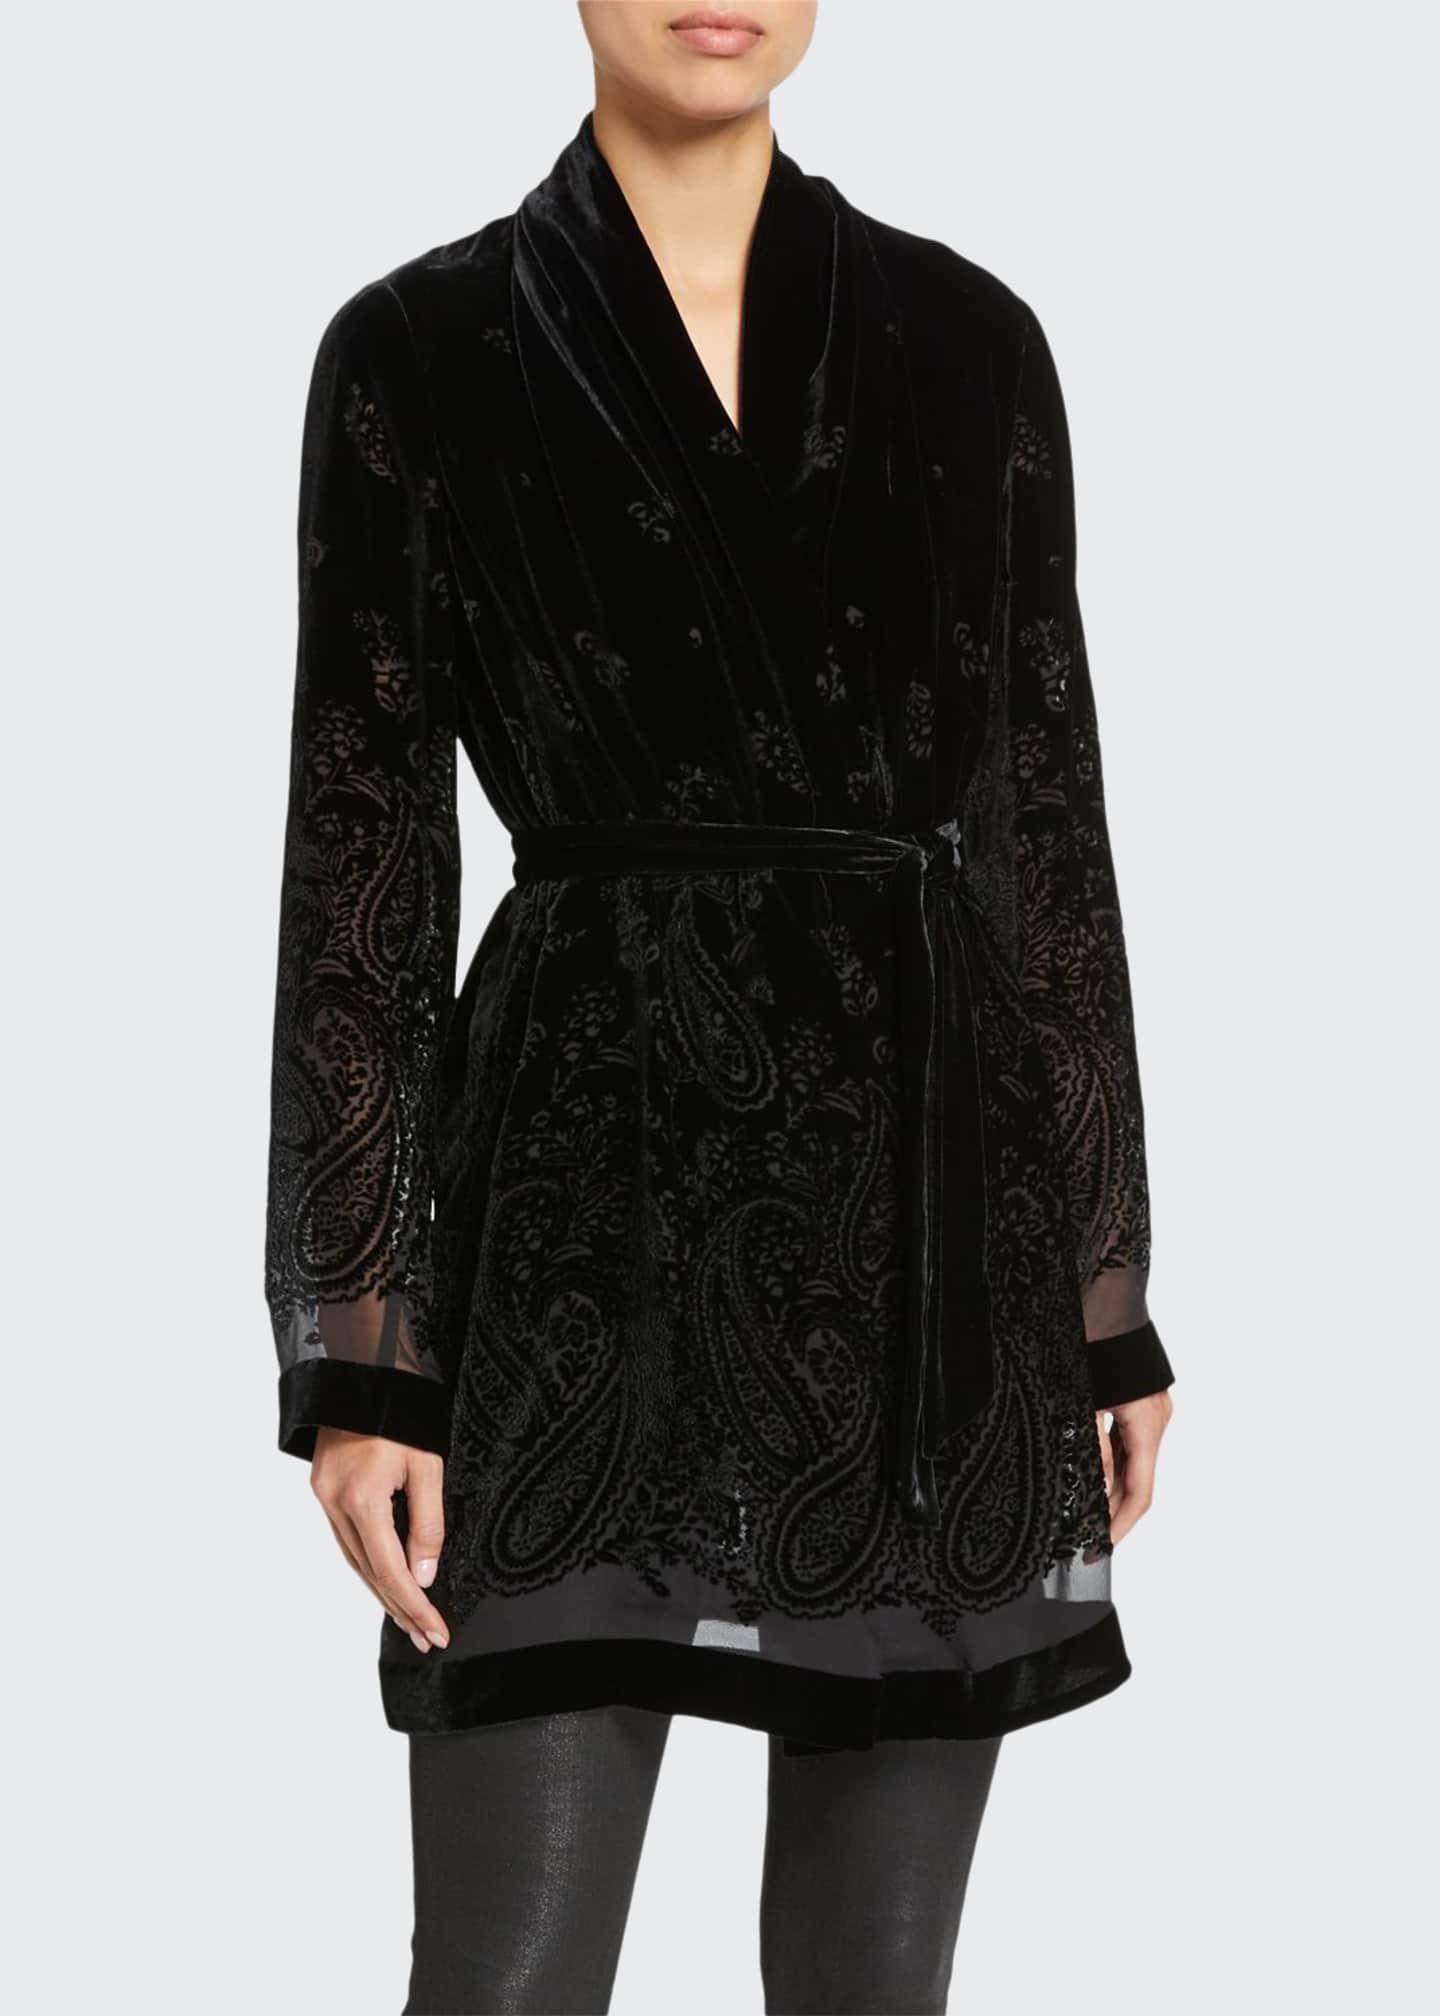 Elie Tahari Coley Paisley Burnout Velvet Jacket